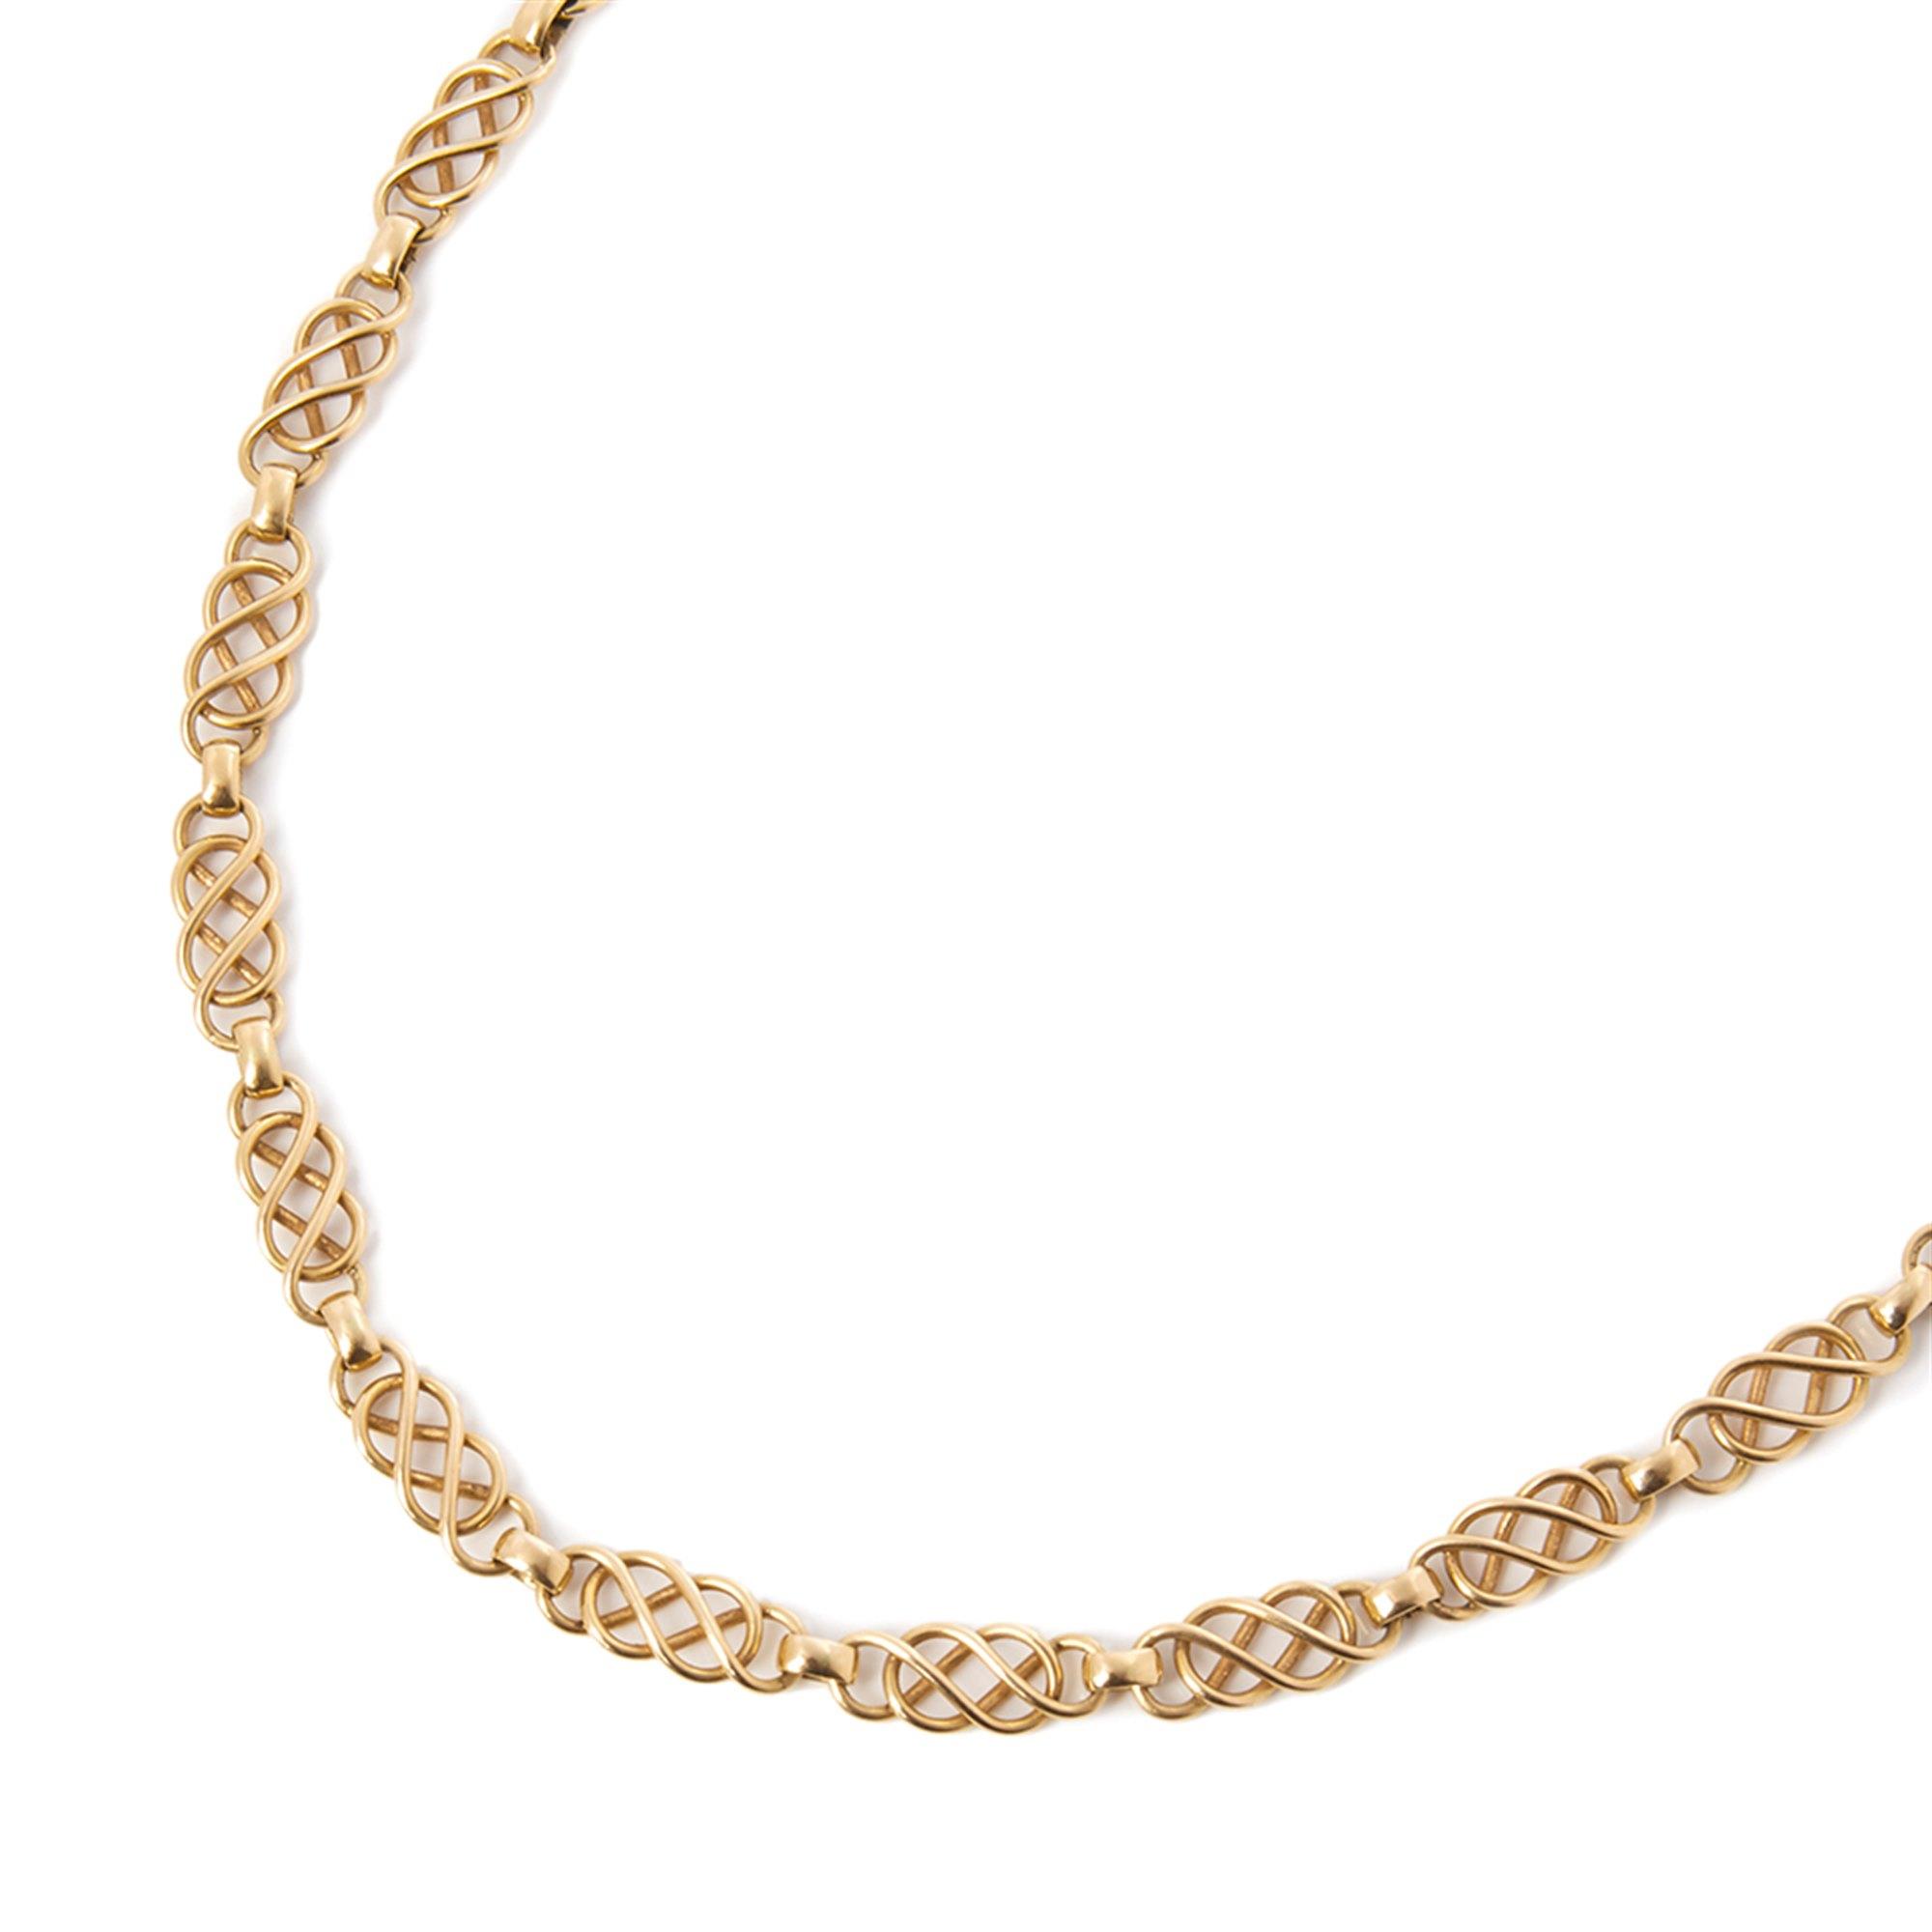 Georg Jensen 18k Yellow Gold Vintage Link Design Necklace